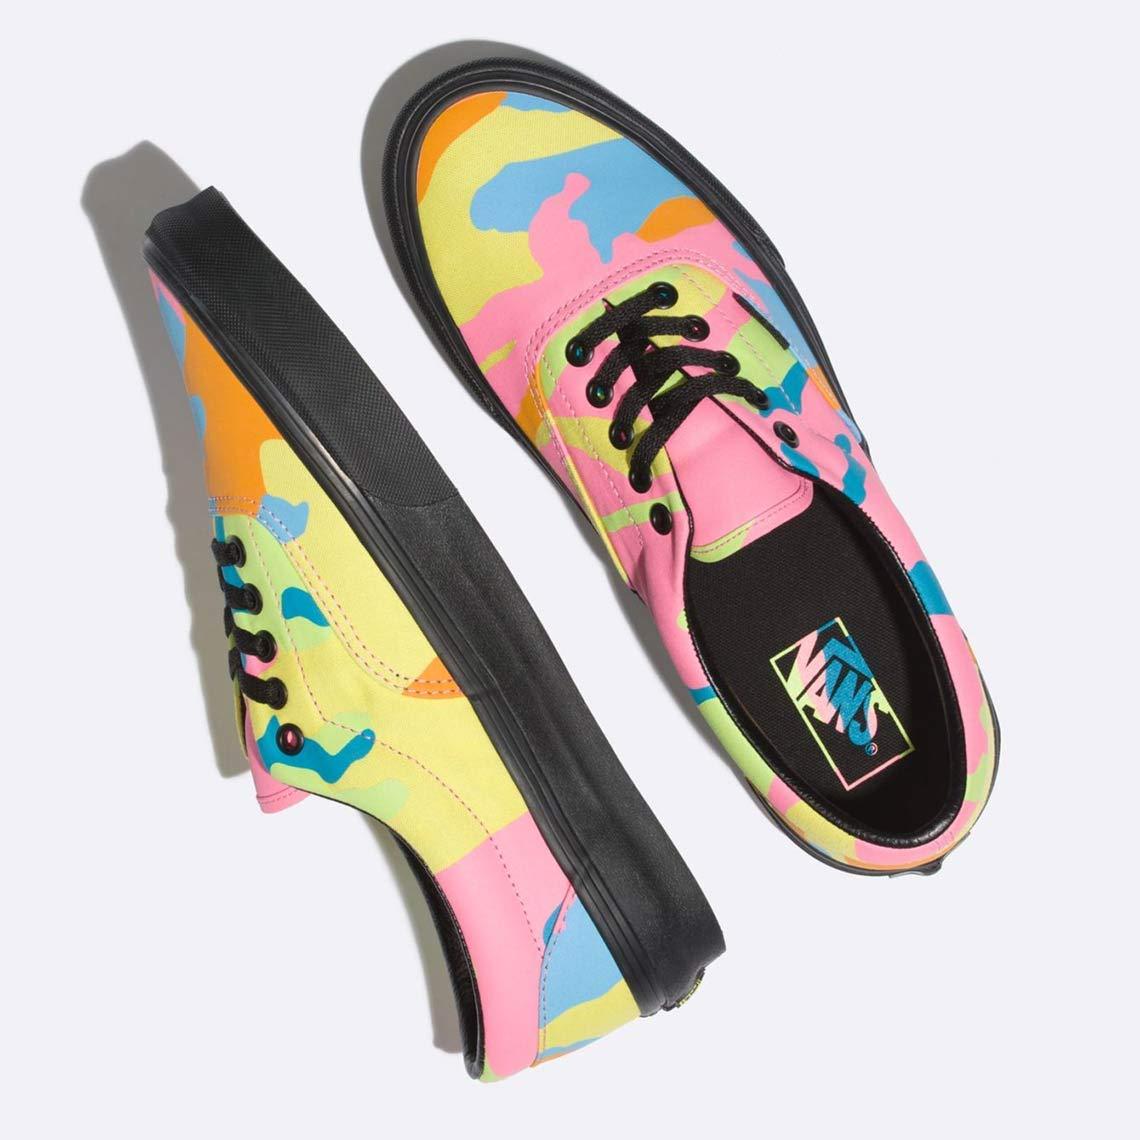 06486dc6edb75 Amazon.com | Vans Era Neon Camo Multi Camo/Black Women's Classic Skate  Shoes Size 8 | Skateboarding